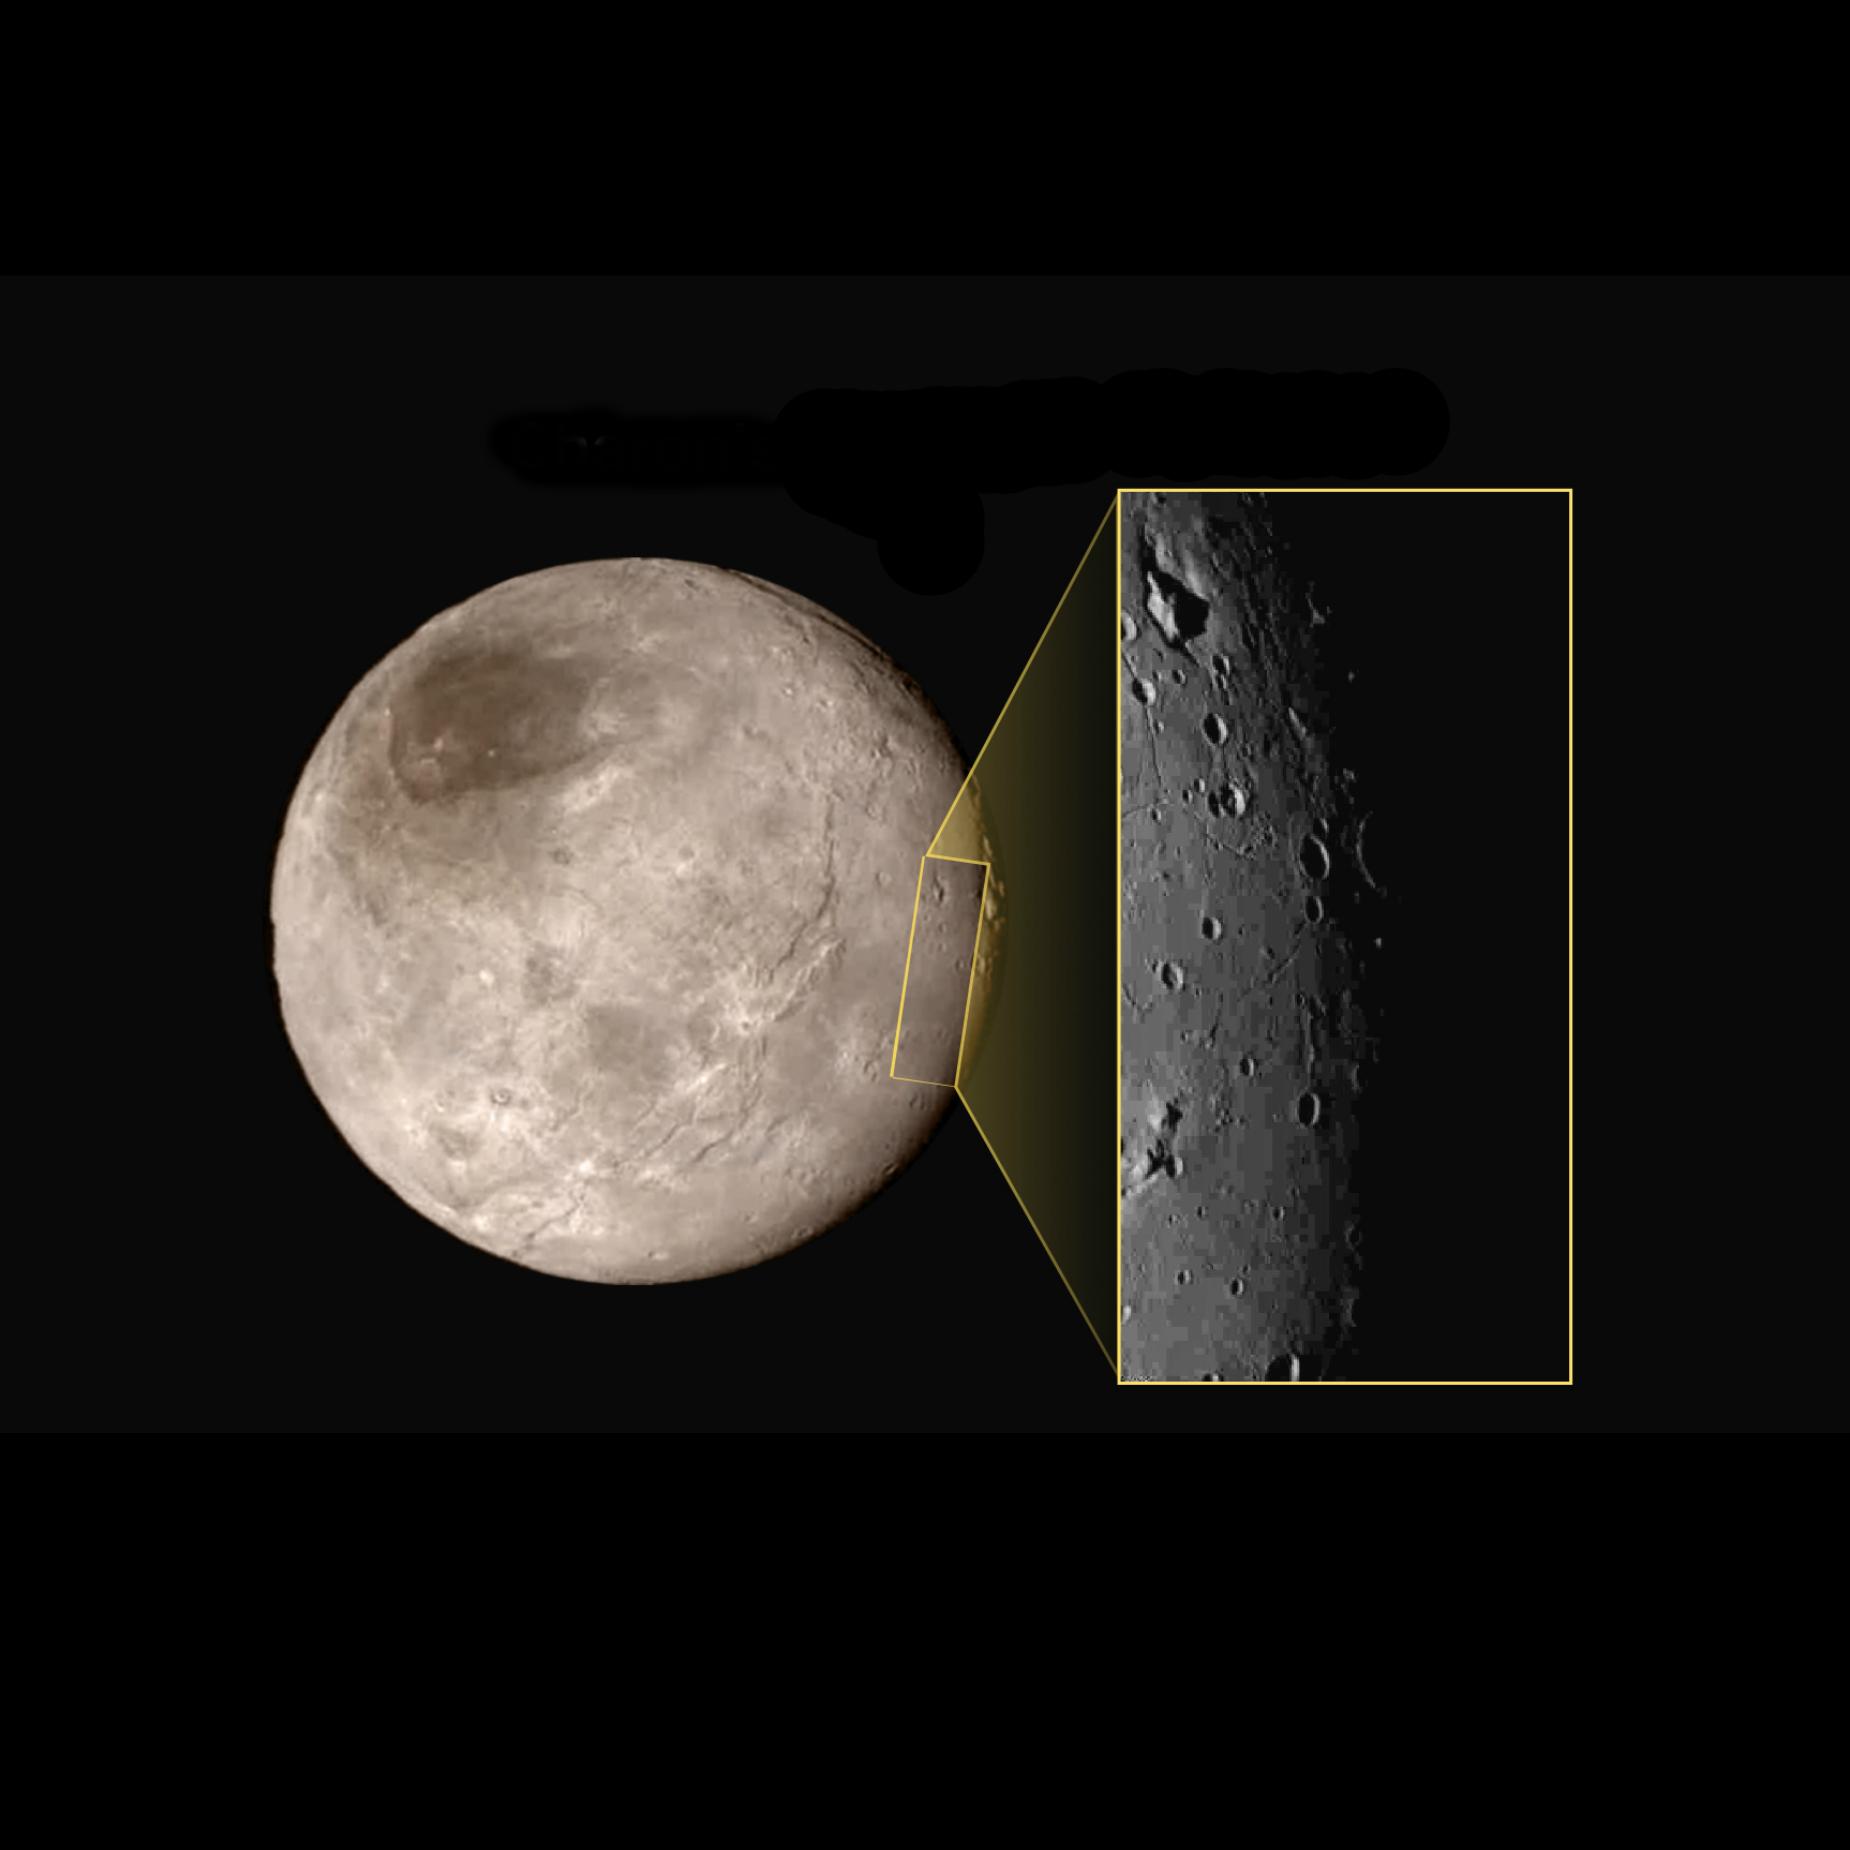 FileNH Charon Closeup21 210150714.jpg   Wikimedia Commons